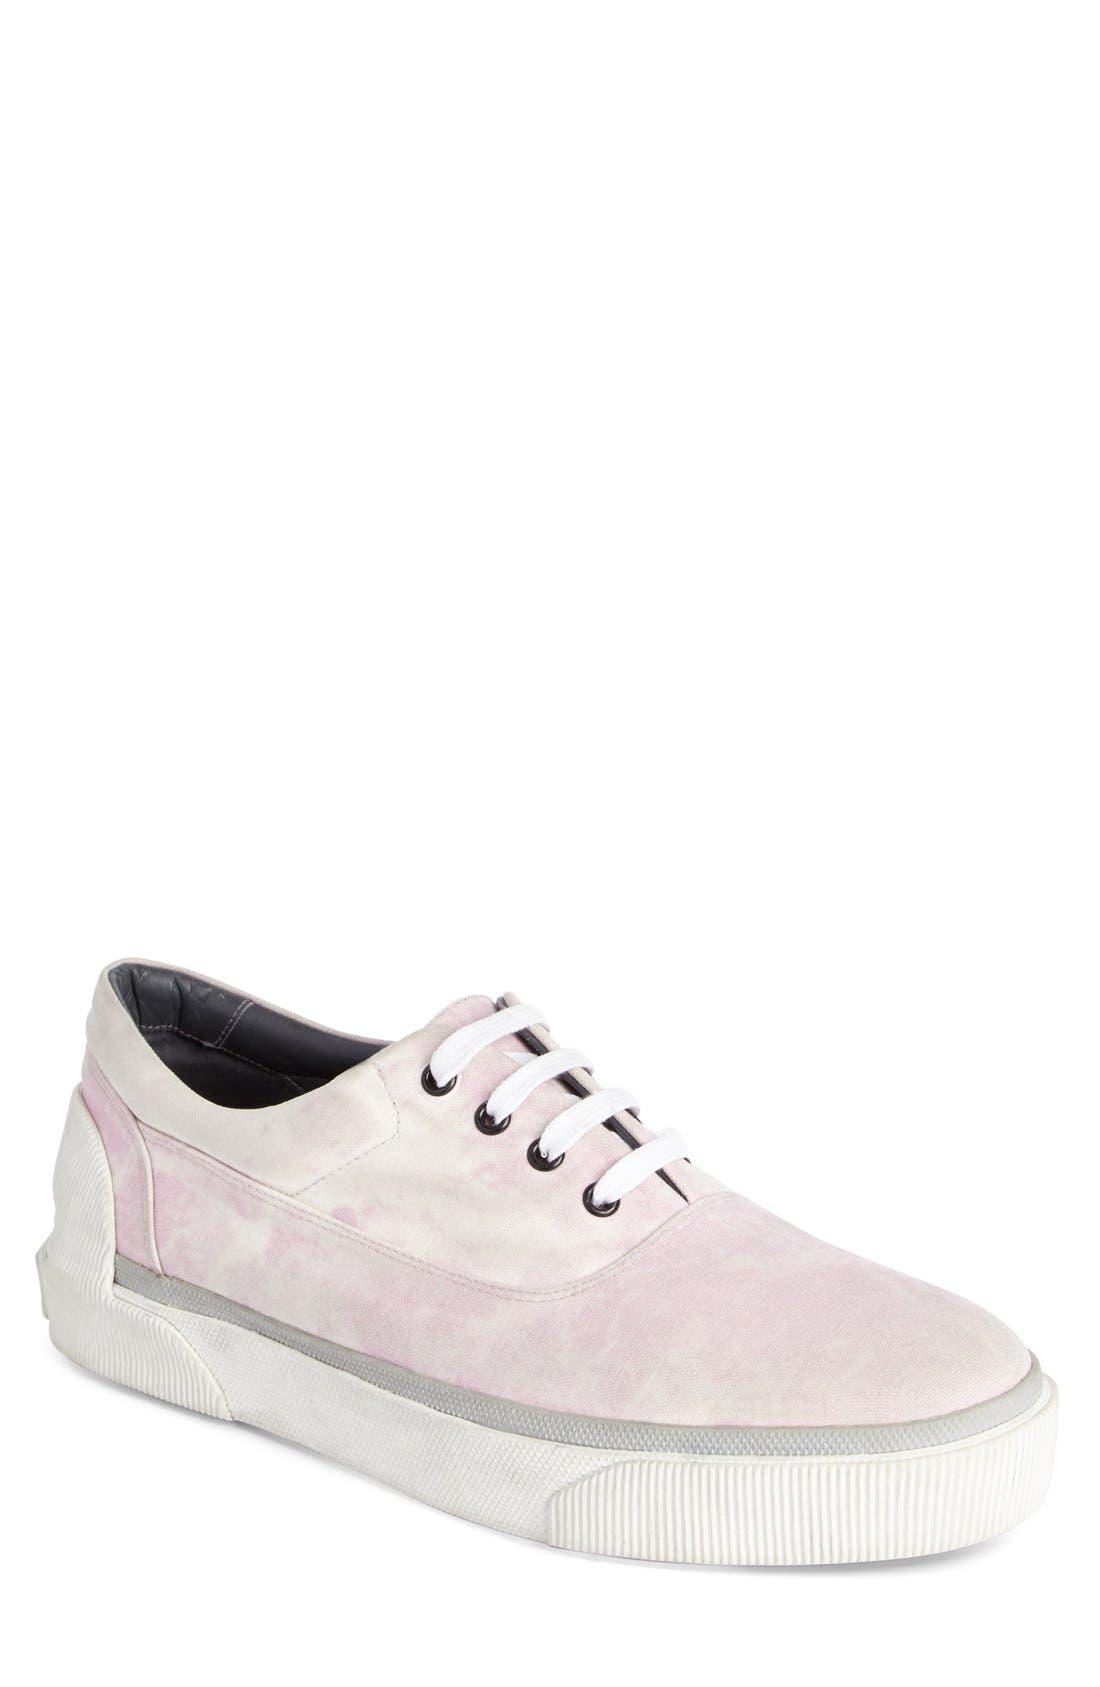 LANVIN Low Top Oxford Sneaker